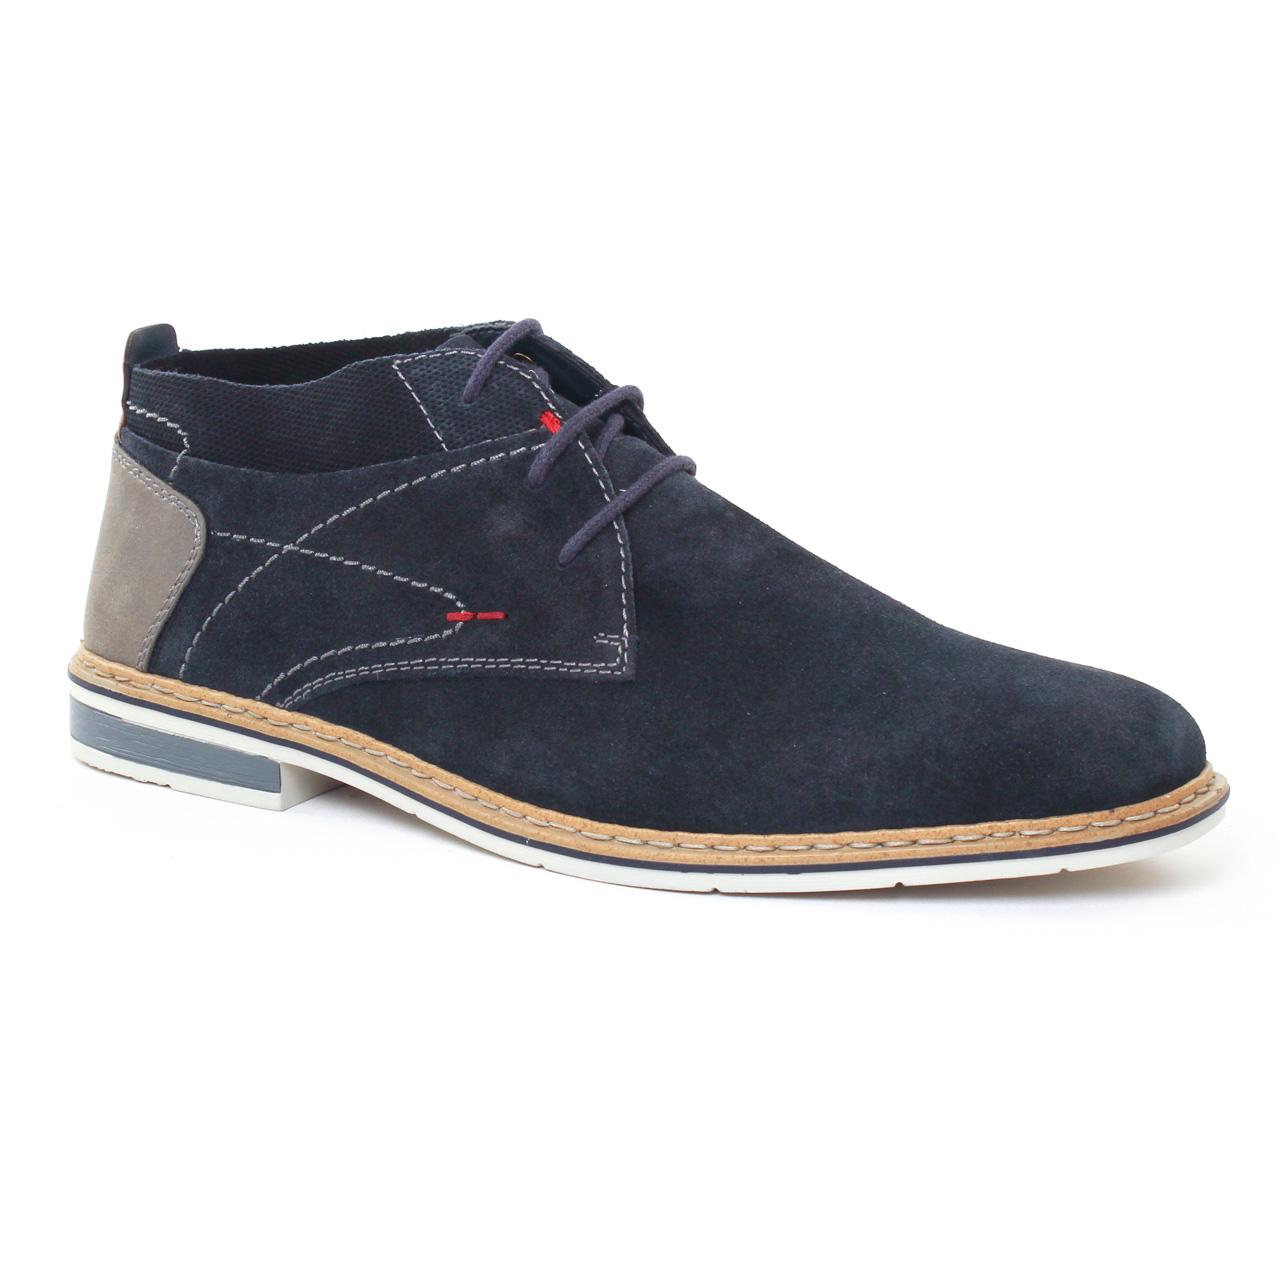 Chaussures homme été 2017 chaussures montantes rieker bleu marine